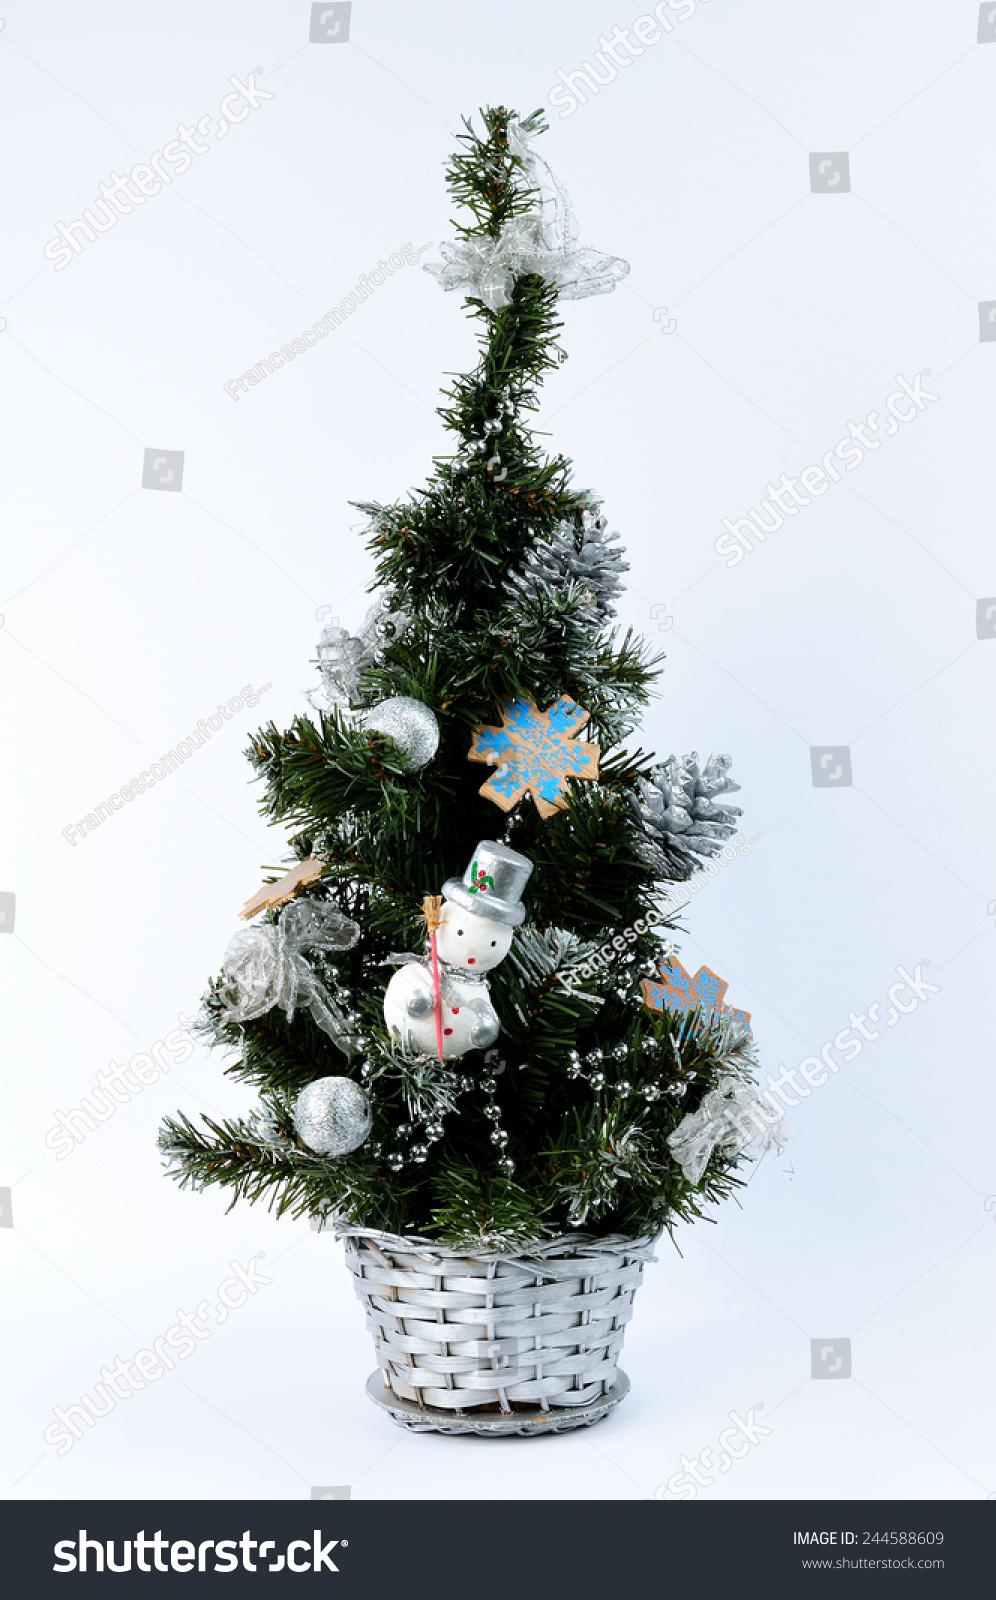 Christmas Tree Decorations Nativity Christian Catholic Stock Photo Edit Now 244588609